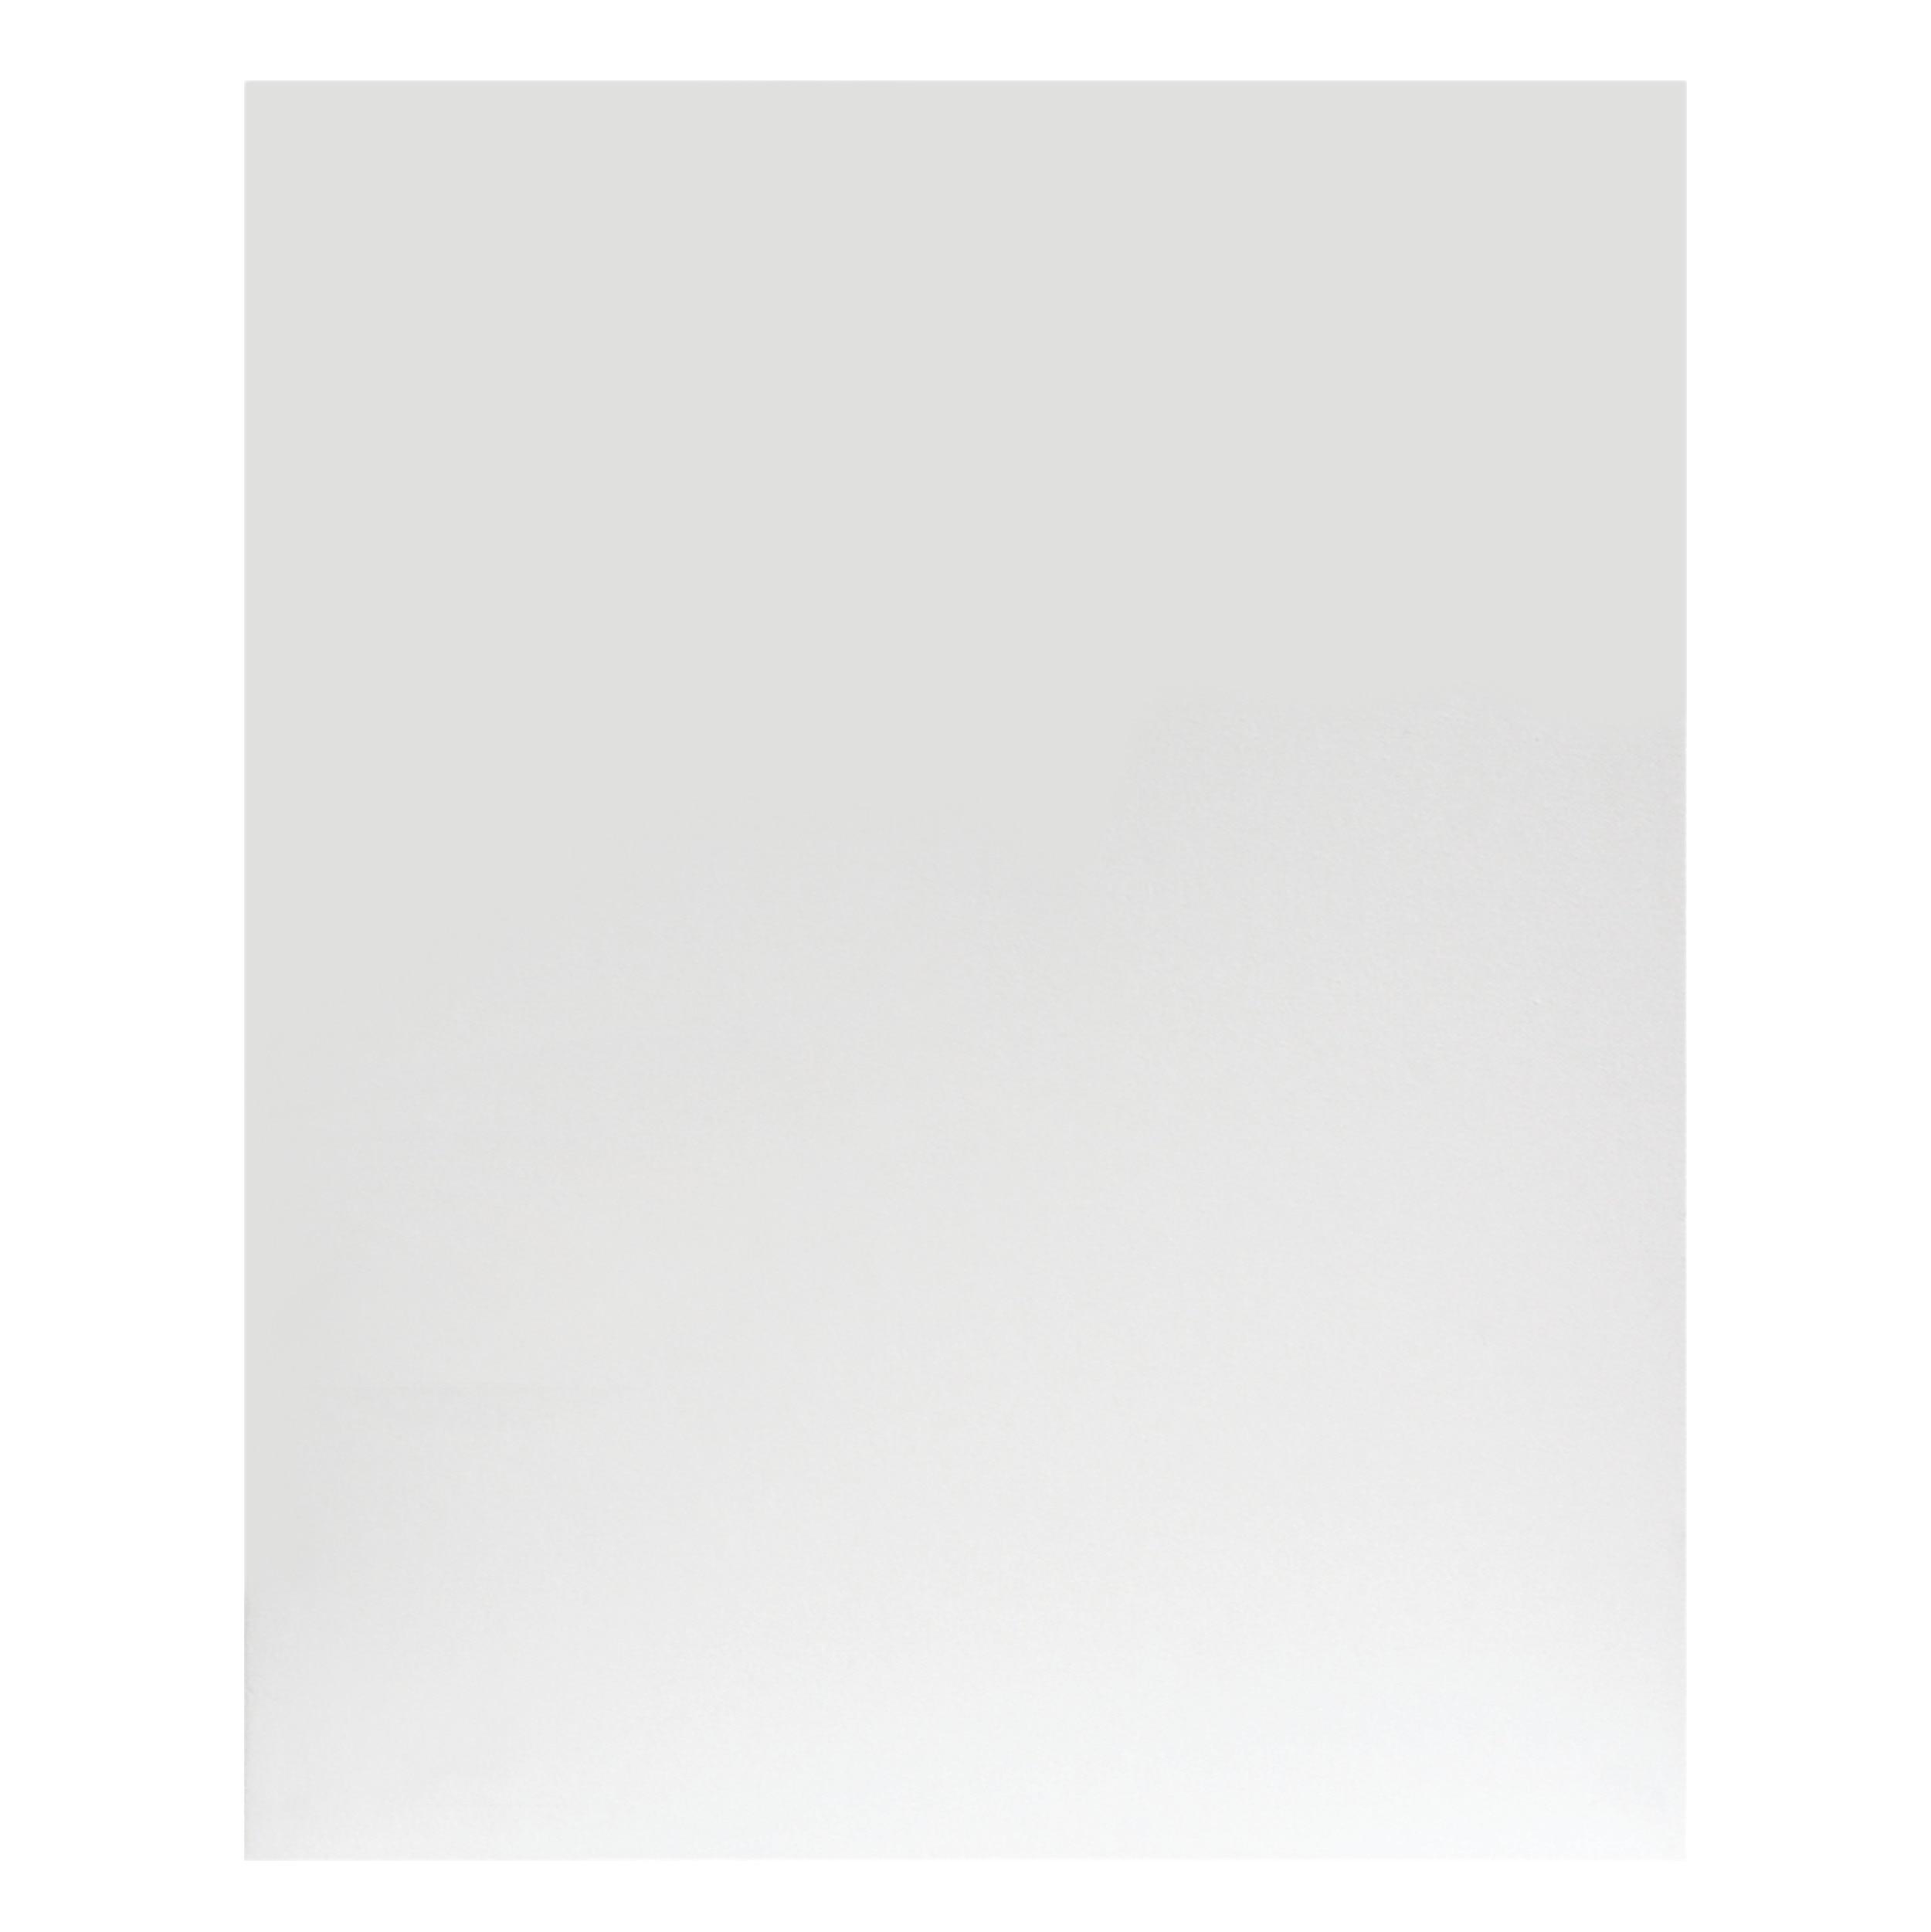 "Art Alternatives Classic Cotton Stretched Canvas, Studio, .75"" Profile, 8"" x 10"""